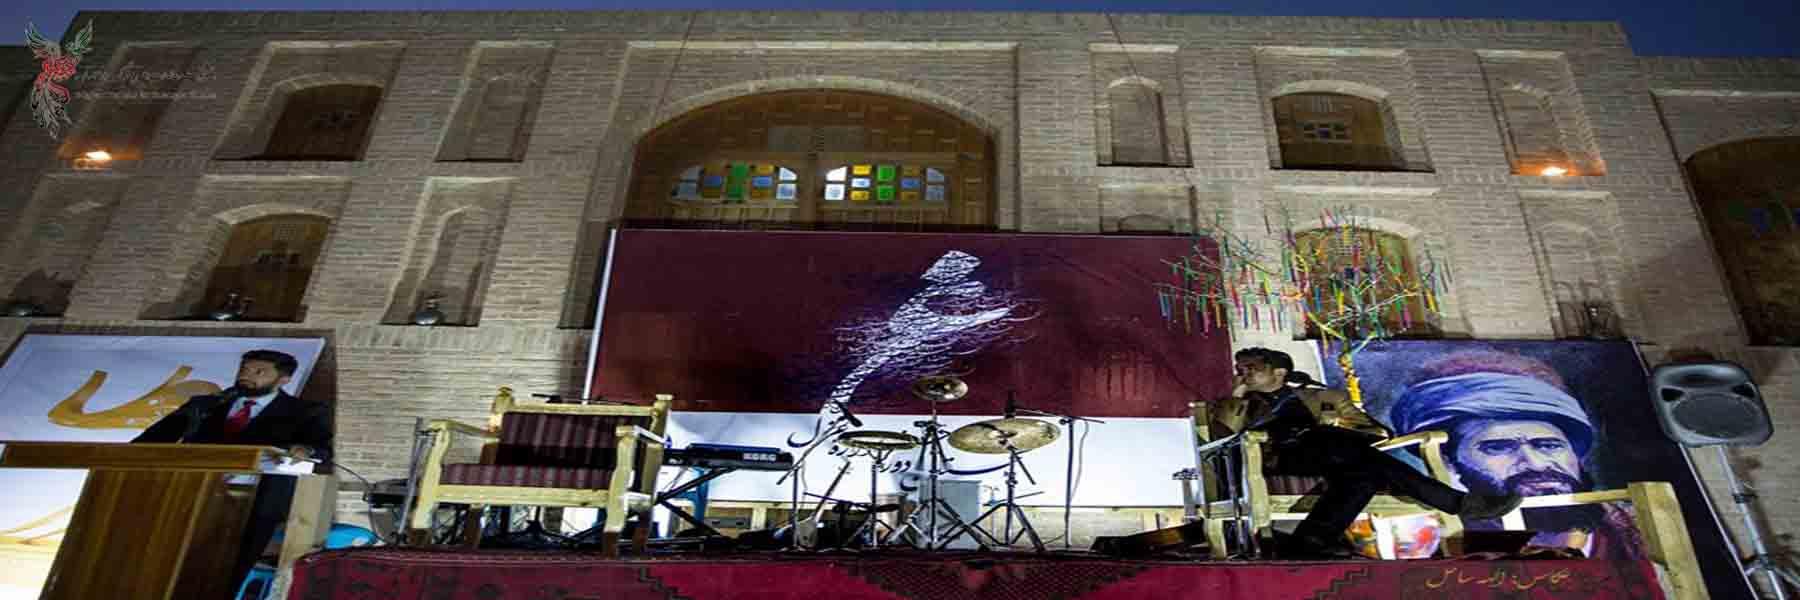 AISS Co-organized first Farsi Ghazal festival in Herat